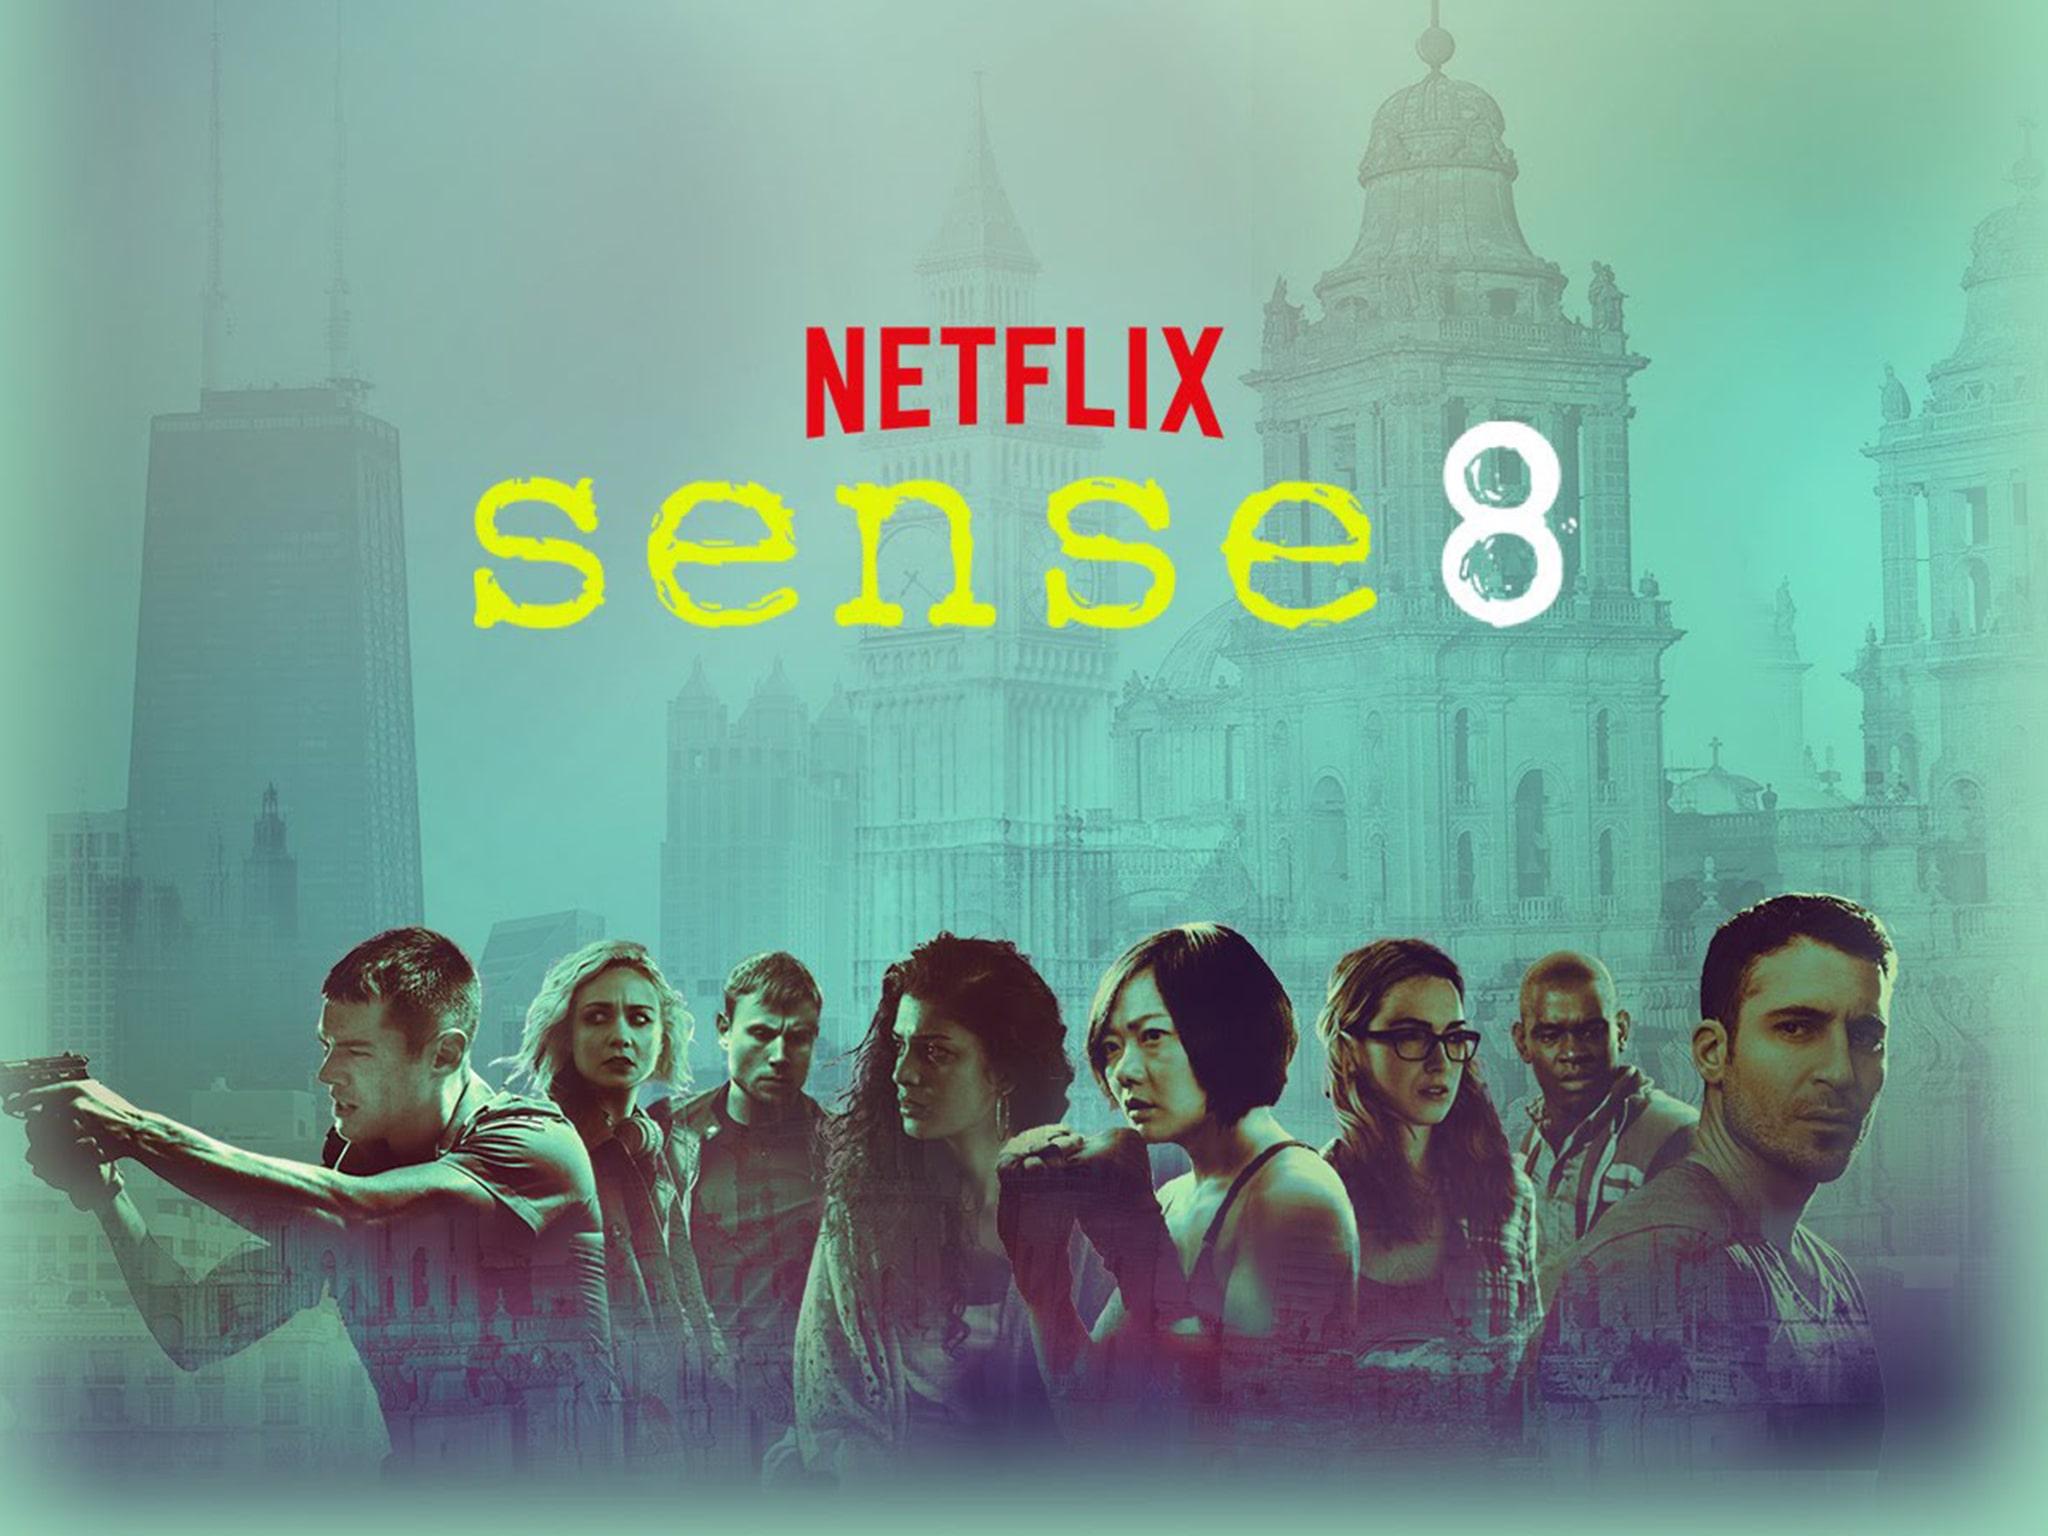 Directors Lana & Lilly Wachowski  S 1 & 2 Netflix  San Francisco, Chicago, Seoul